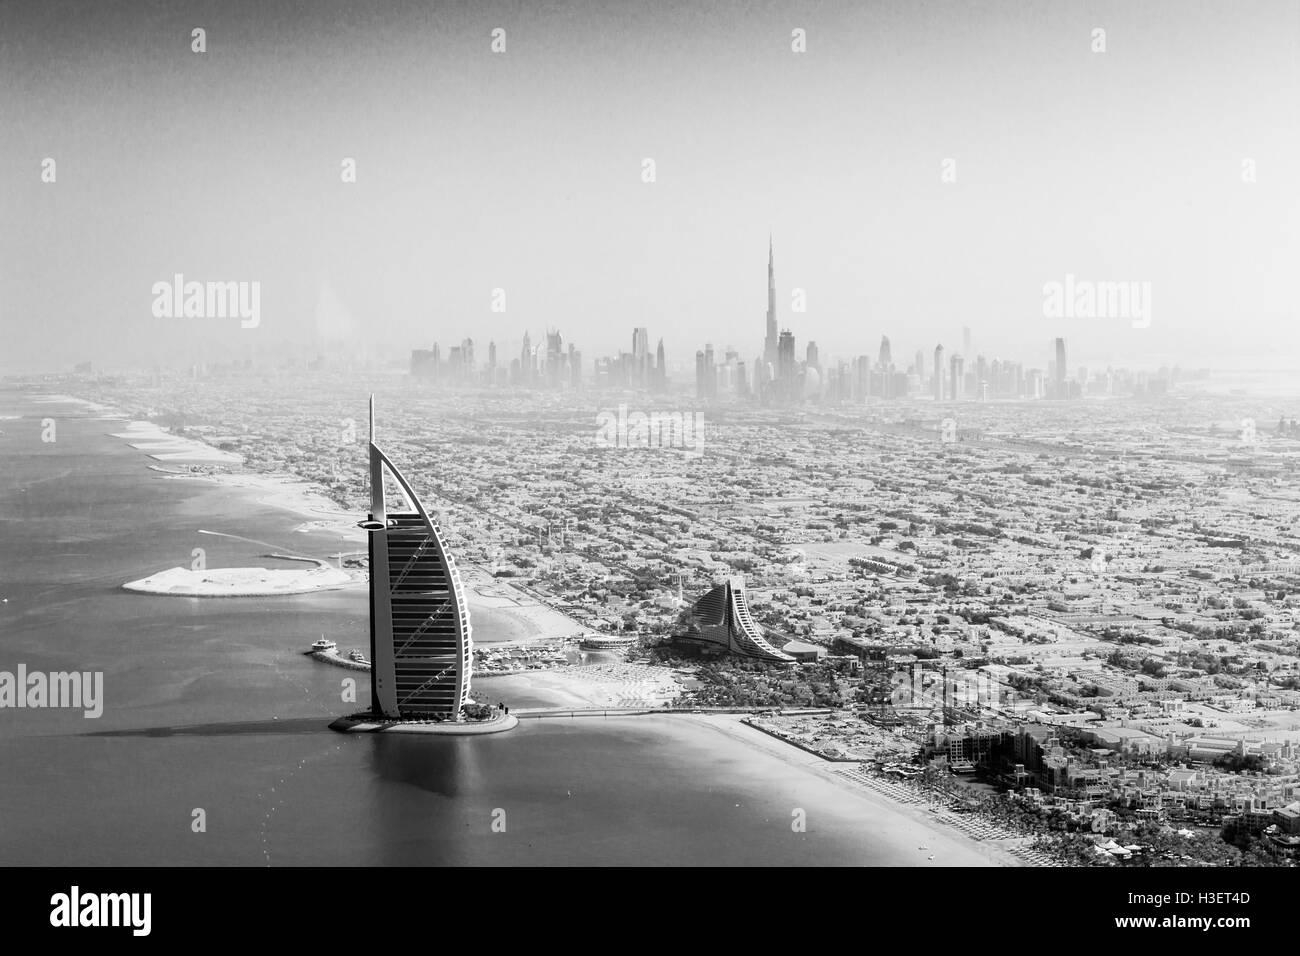 Dubai united arab emirates october 17 2014 the famous burj al arab